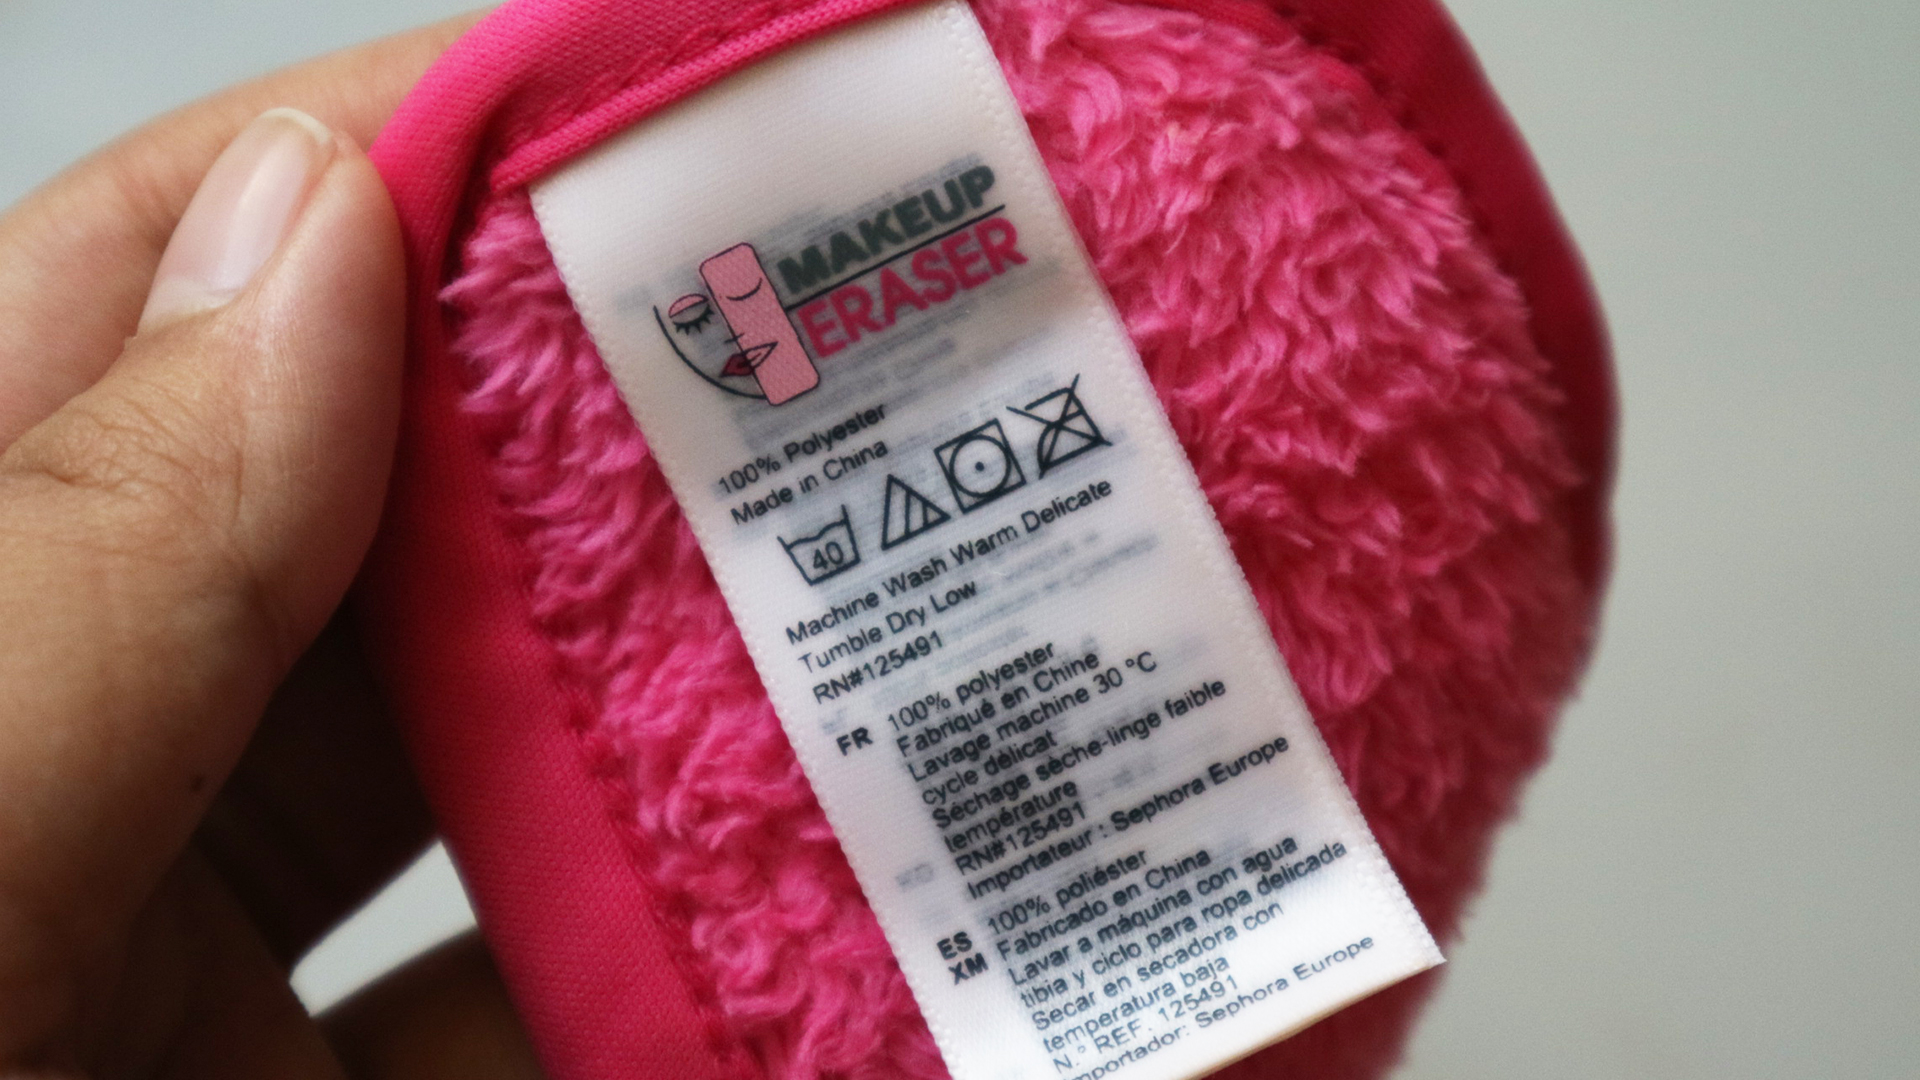 1805-08-The-Original-MakeUp-Eraser-review-Samantha-Gonzales-03.jpg